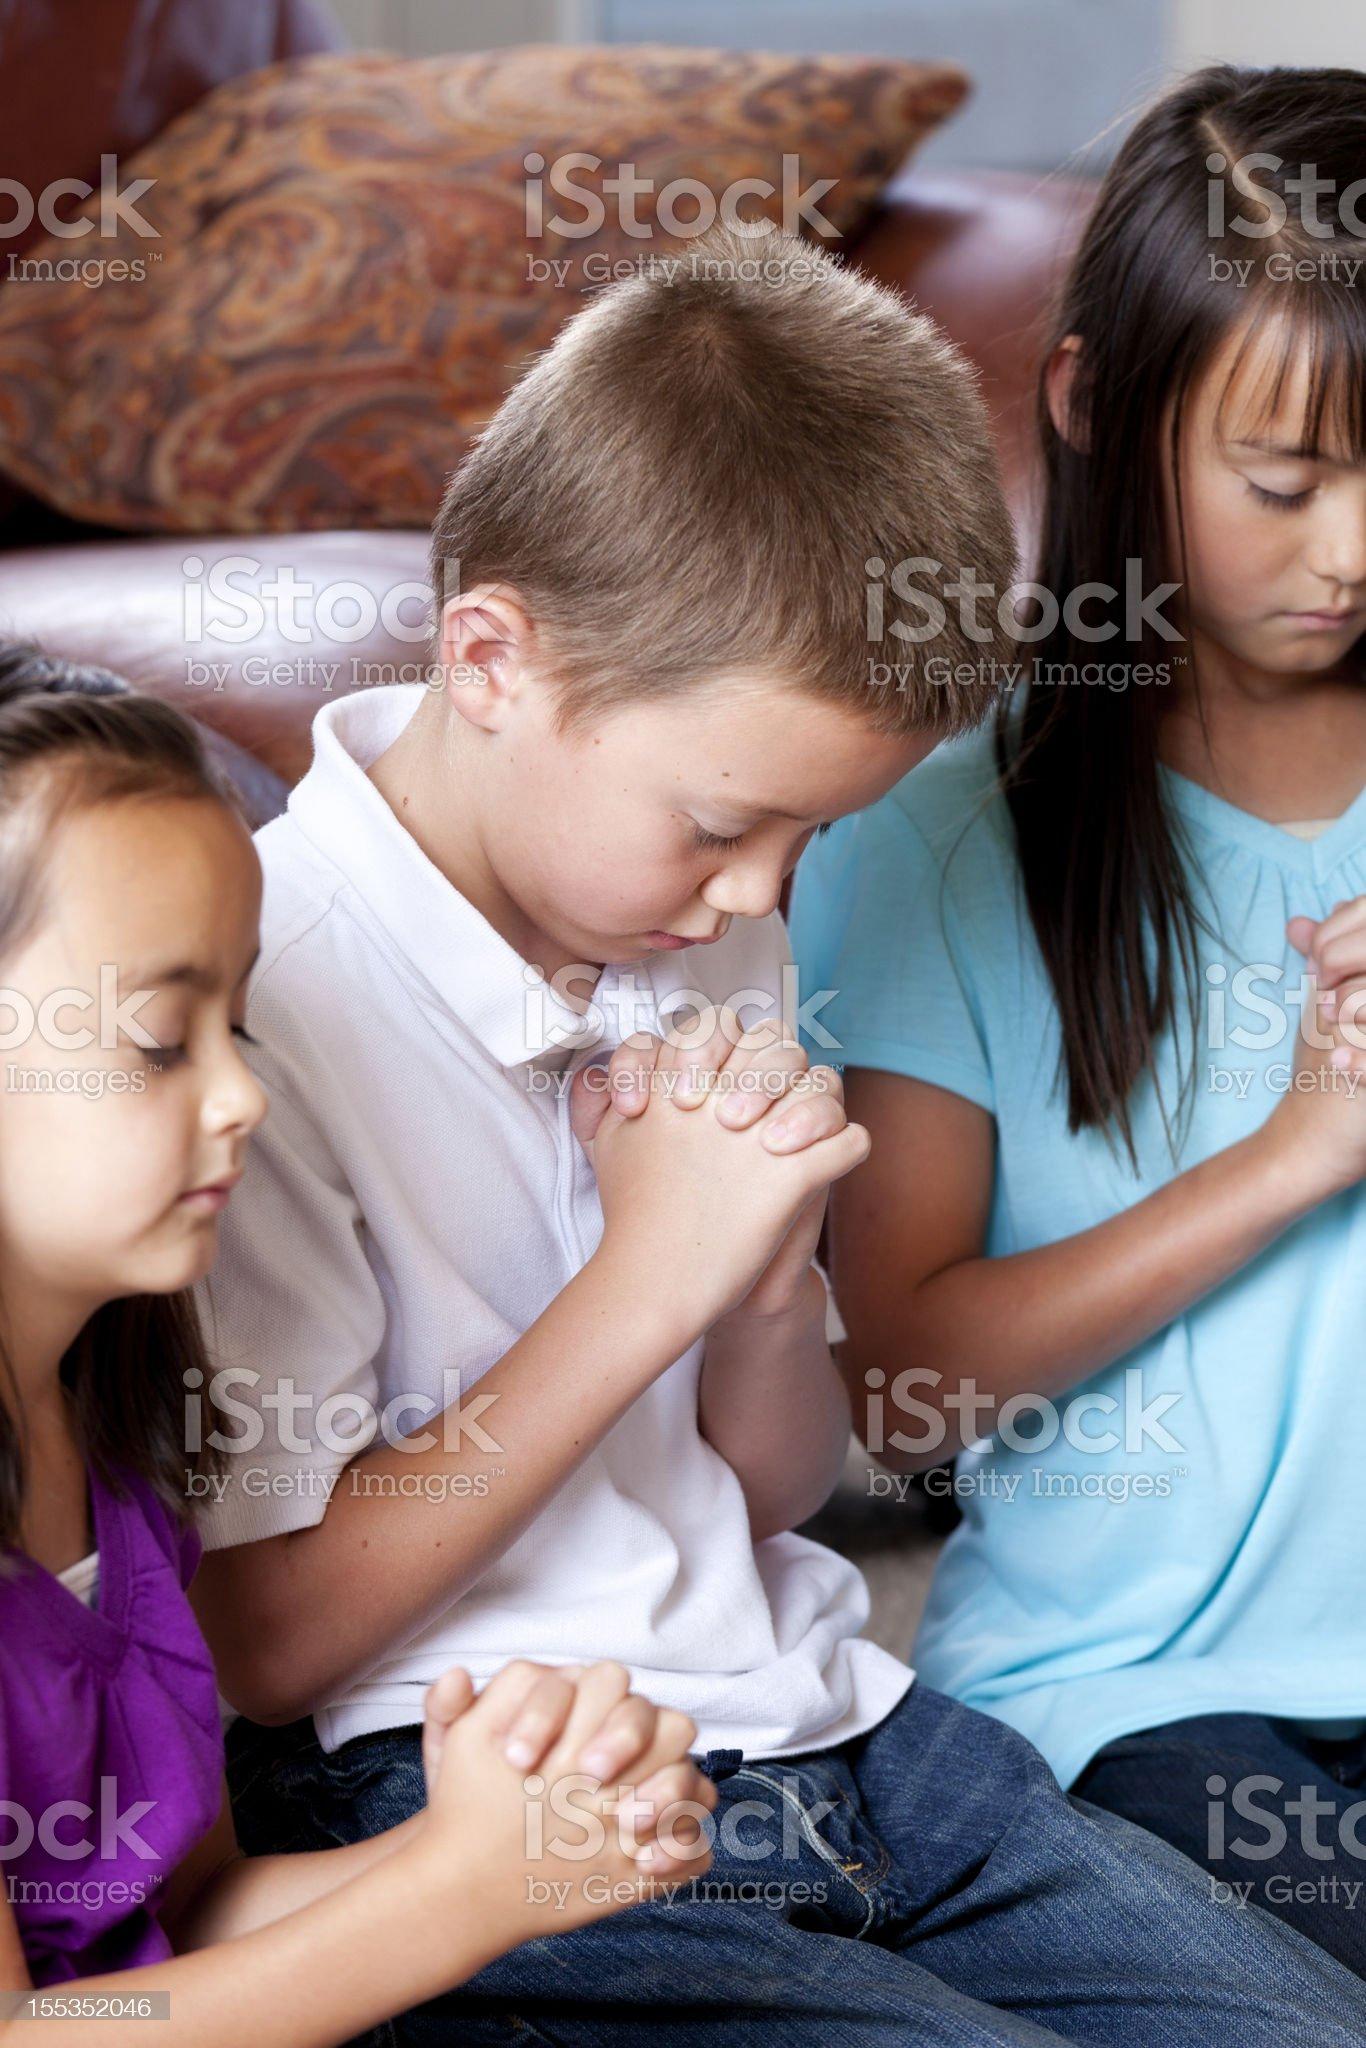 Children Praying royalty-free stock photo